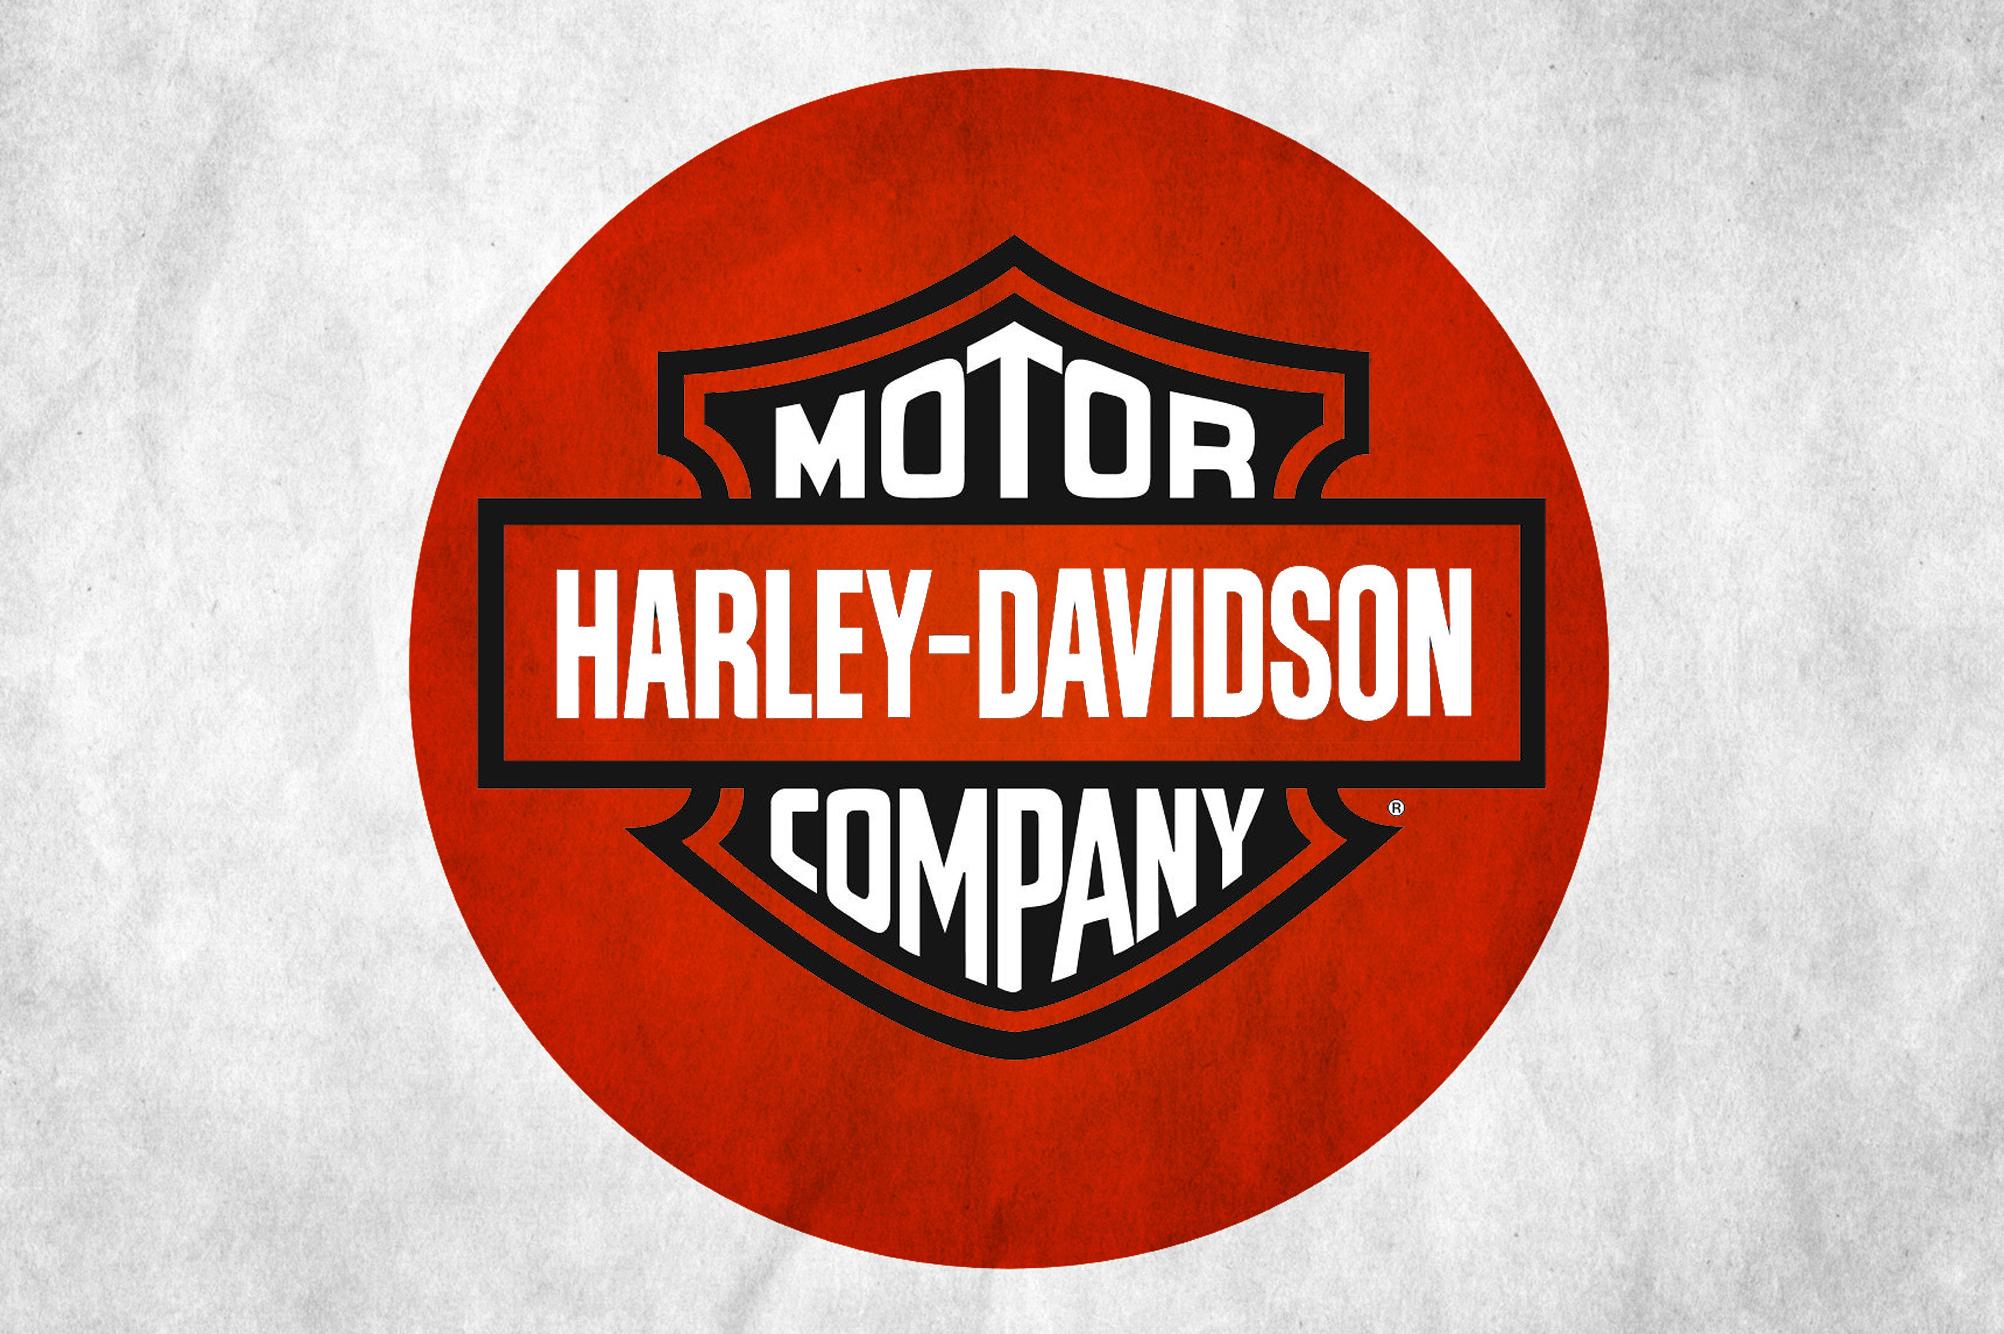 Harley davidson acquired by japanese owned kawasaki motor for Harley davidson motor co